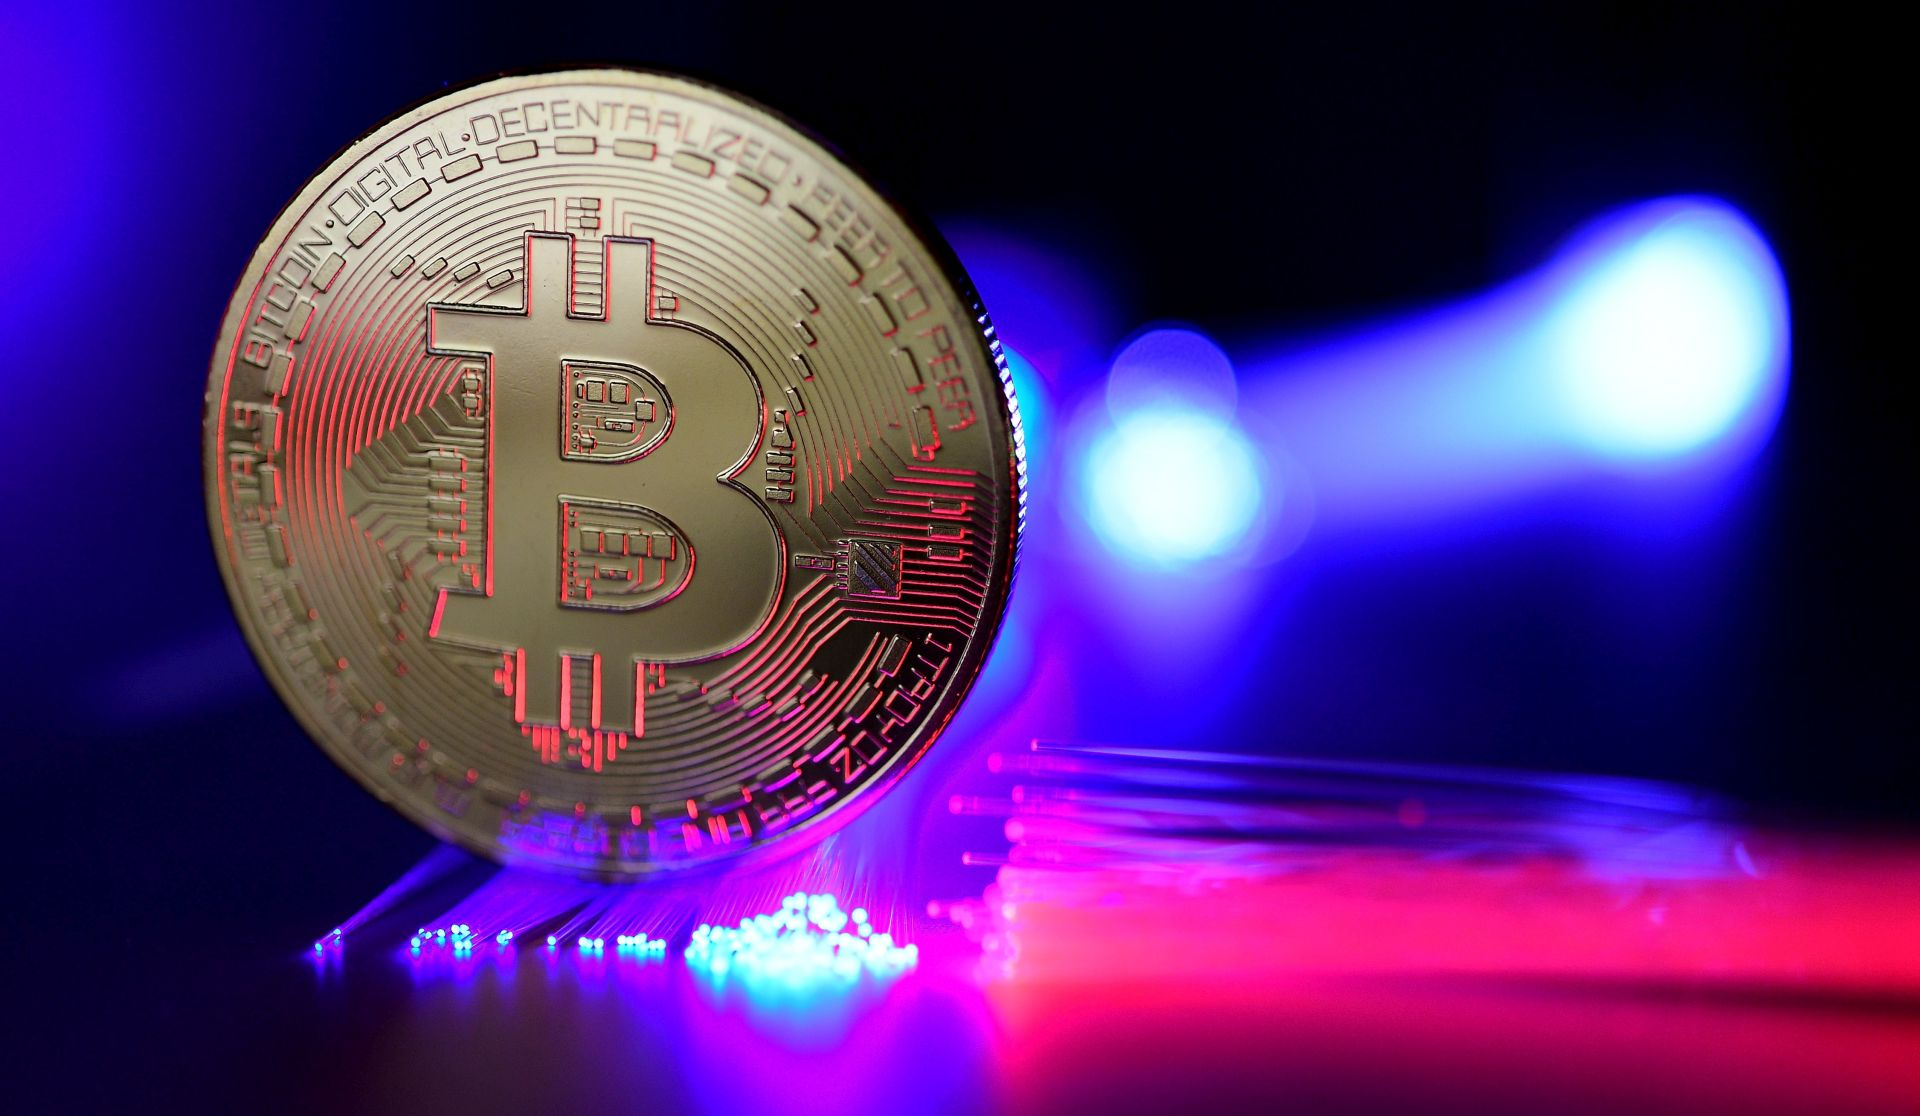 DUŽNOSNIK ECB-A 'Bitcoin treba oporezivati i regulirati'